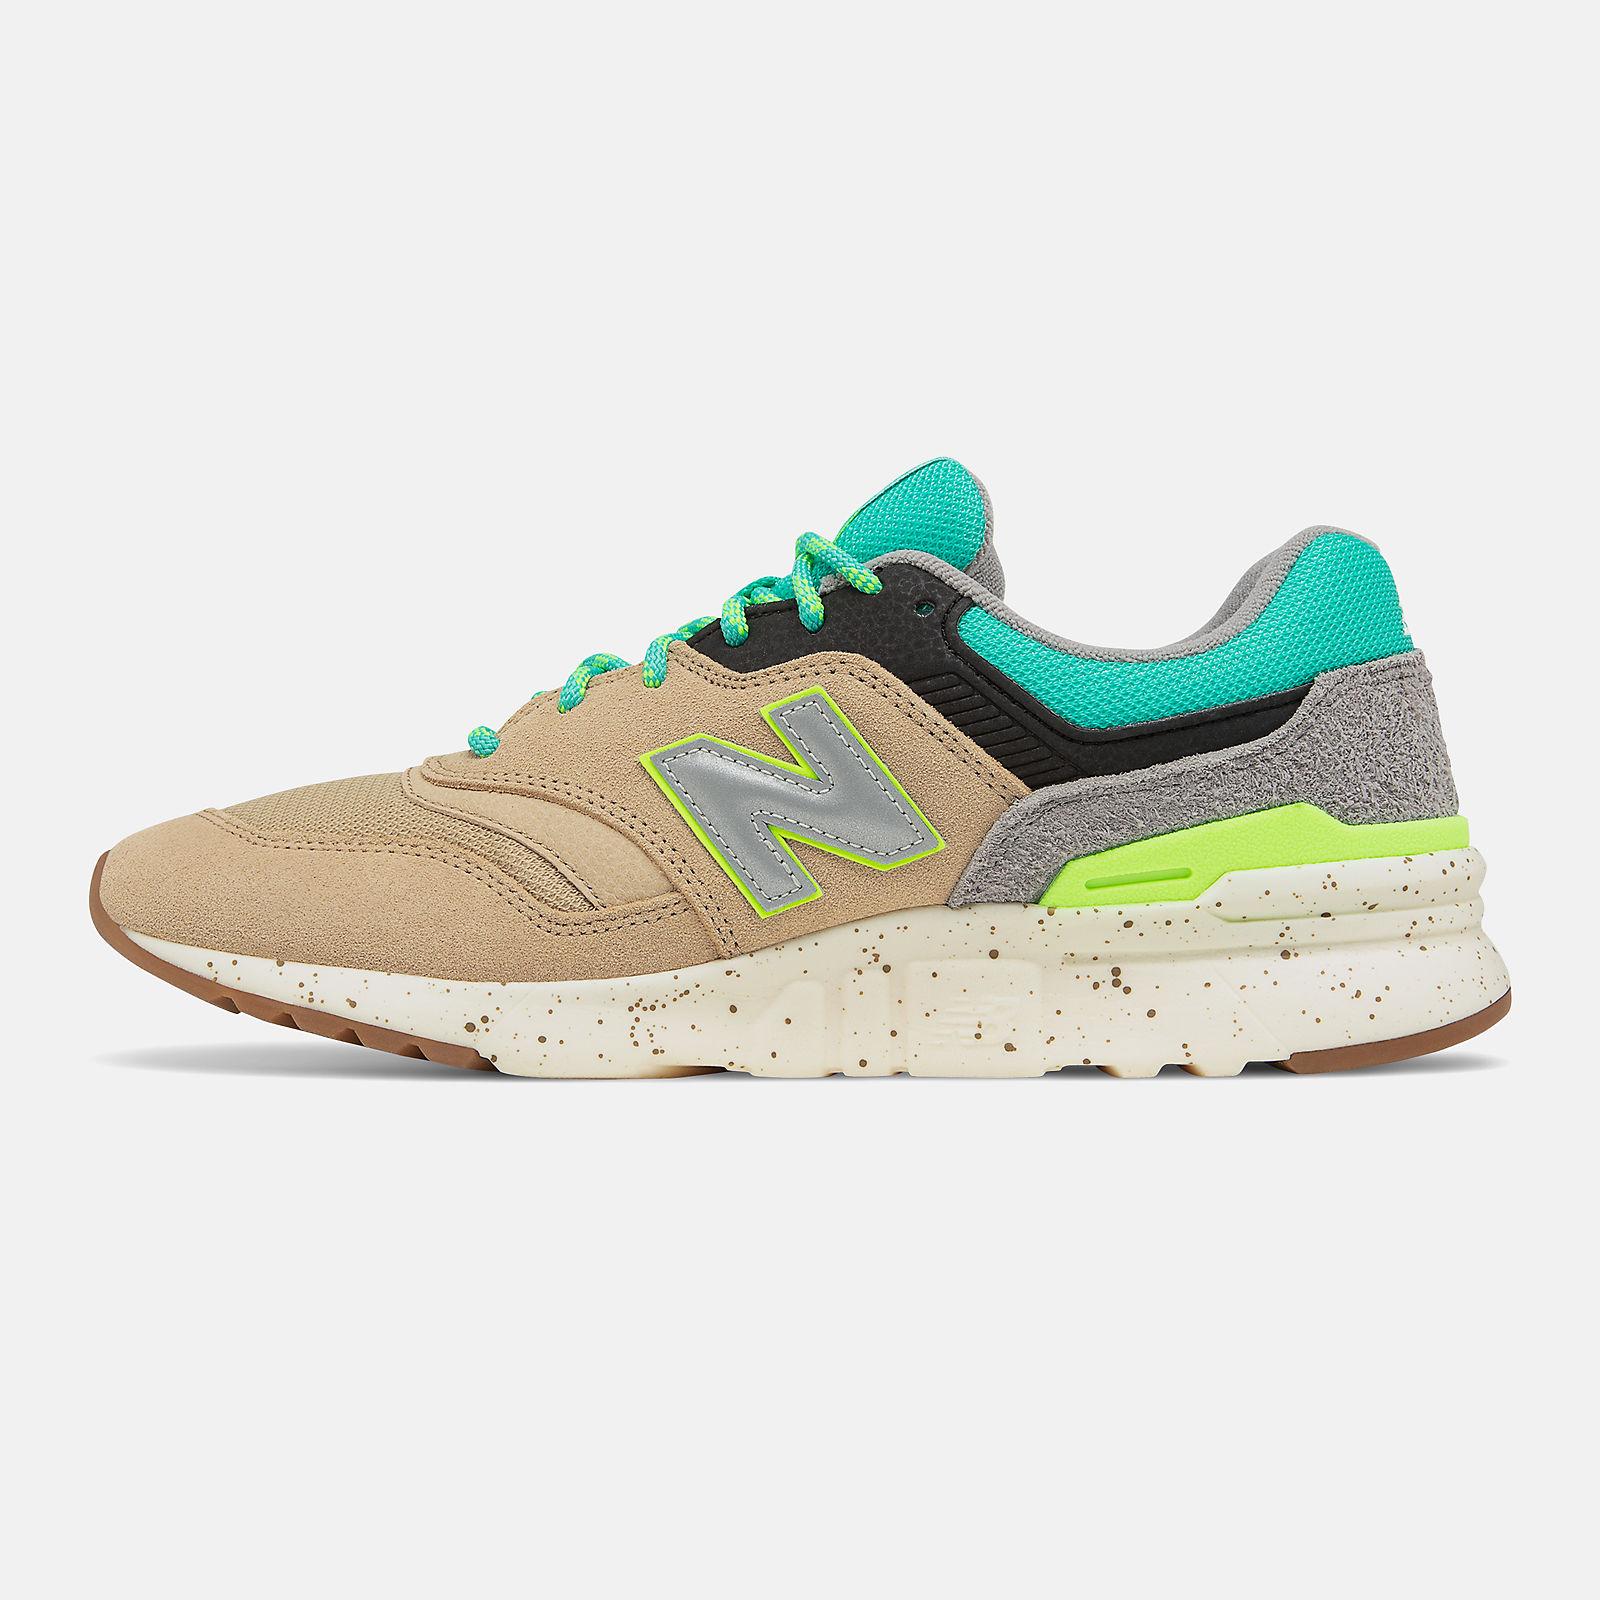 new balance 997 h